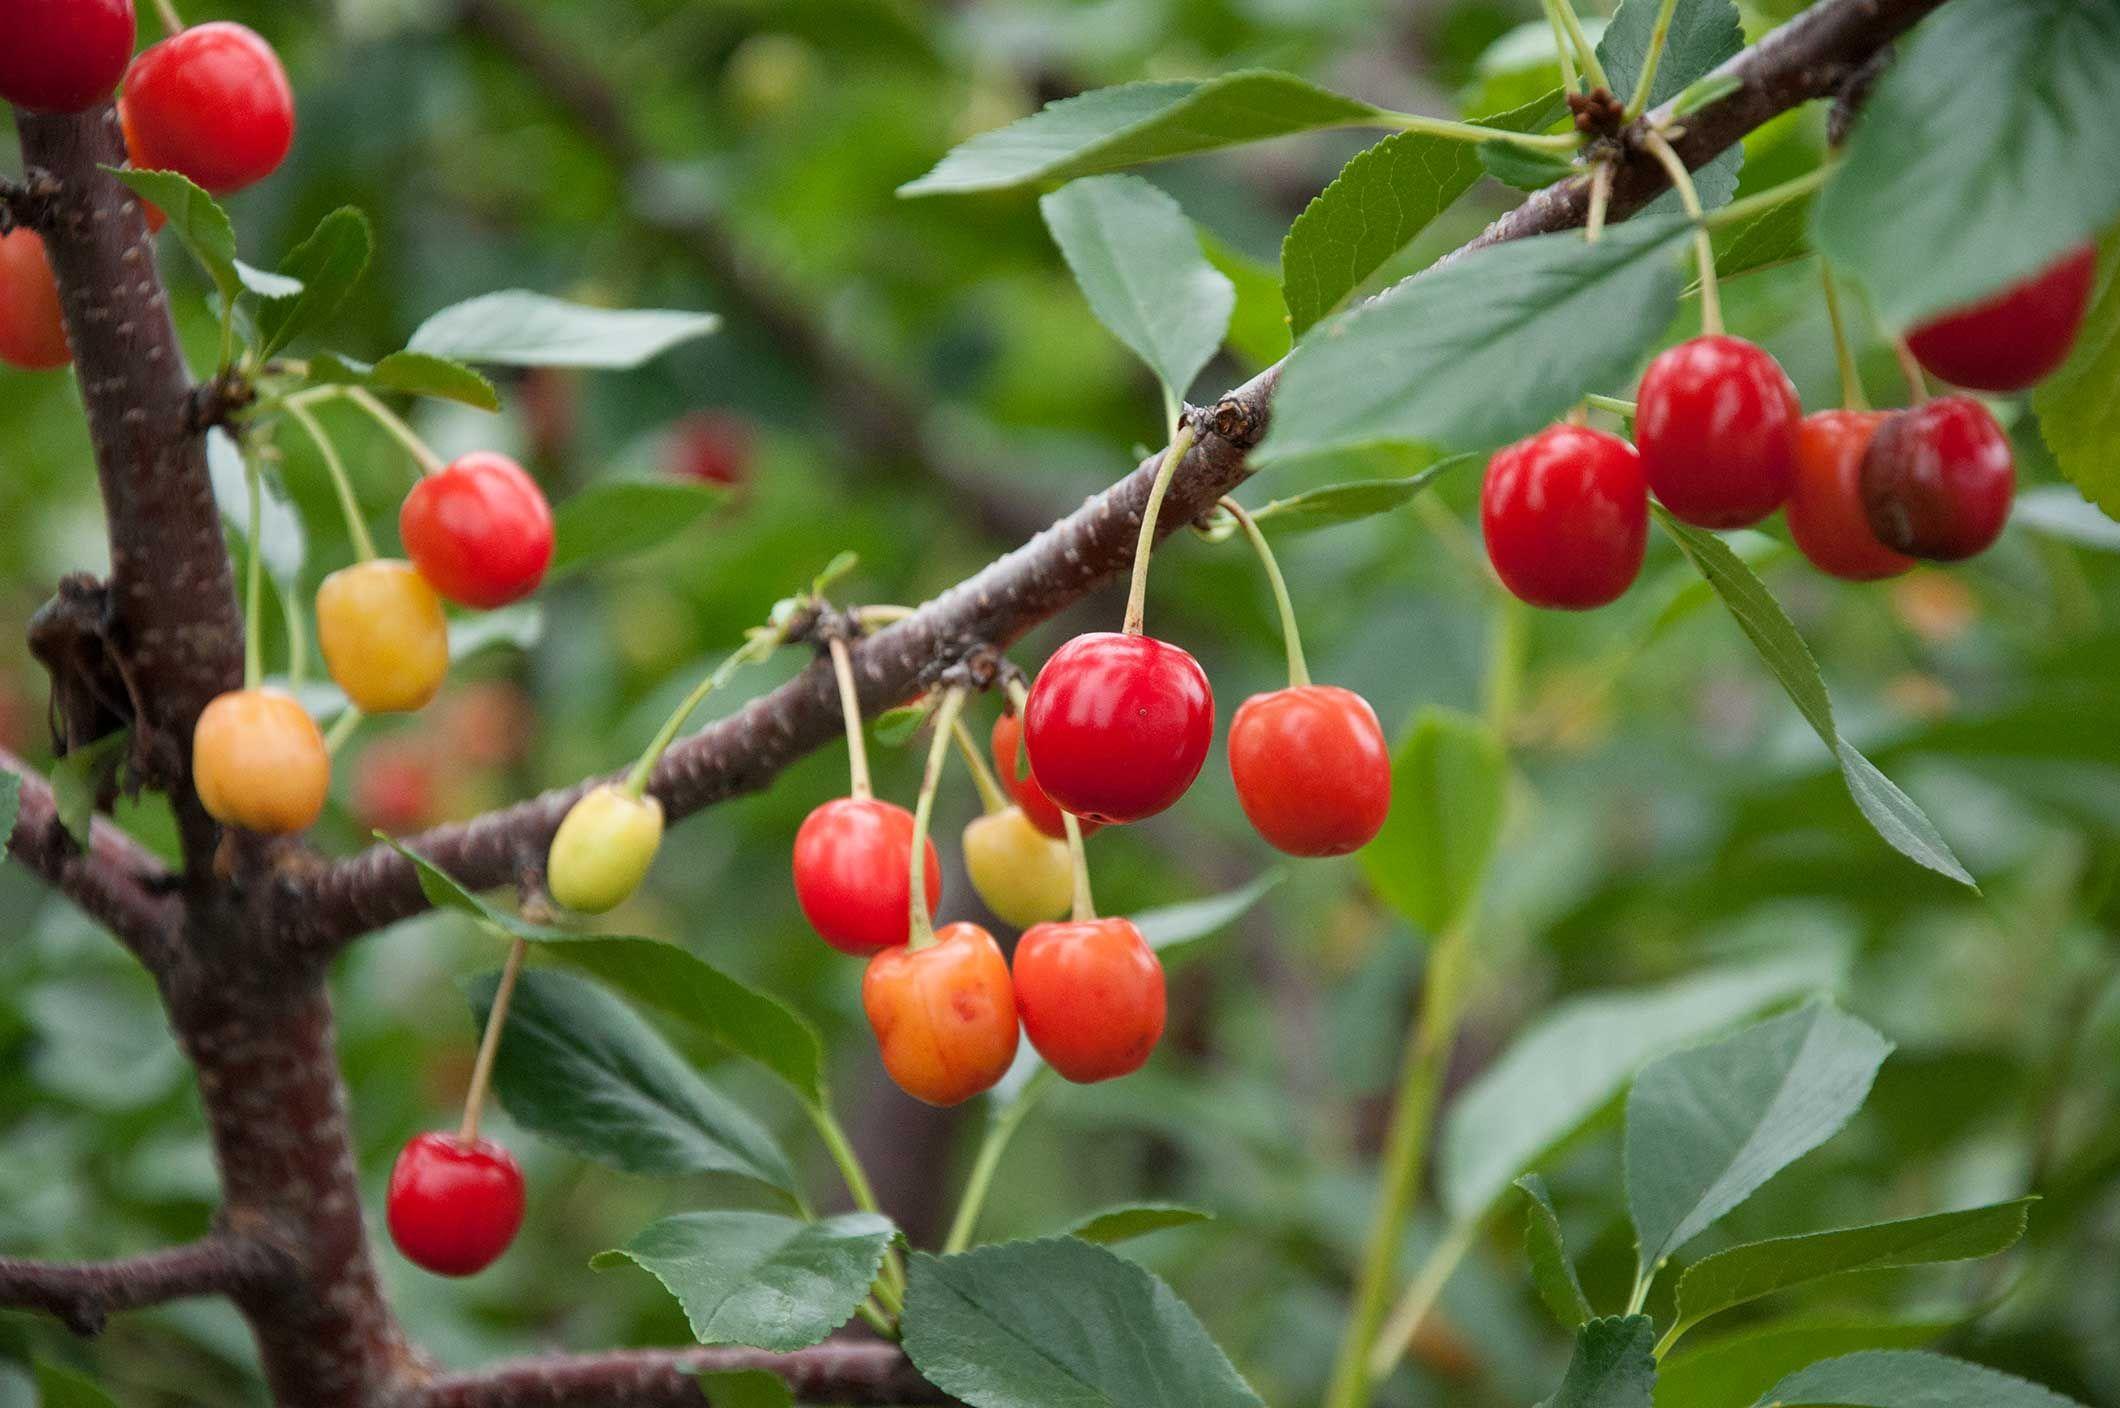 How To Grow Cherry Trees How To Grow Cherries Growing Cherry Trees Cherry Seeds